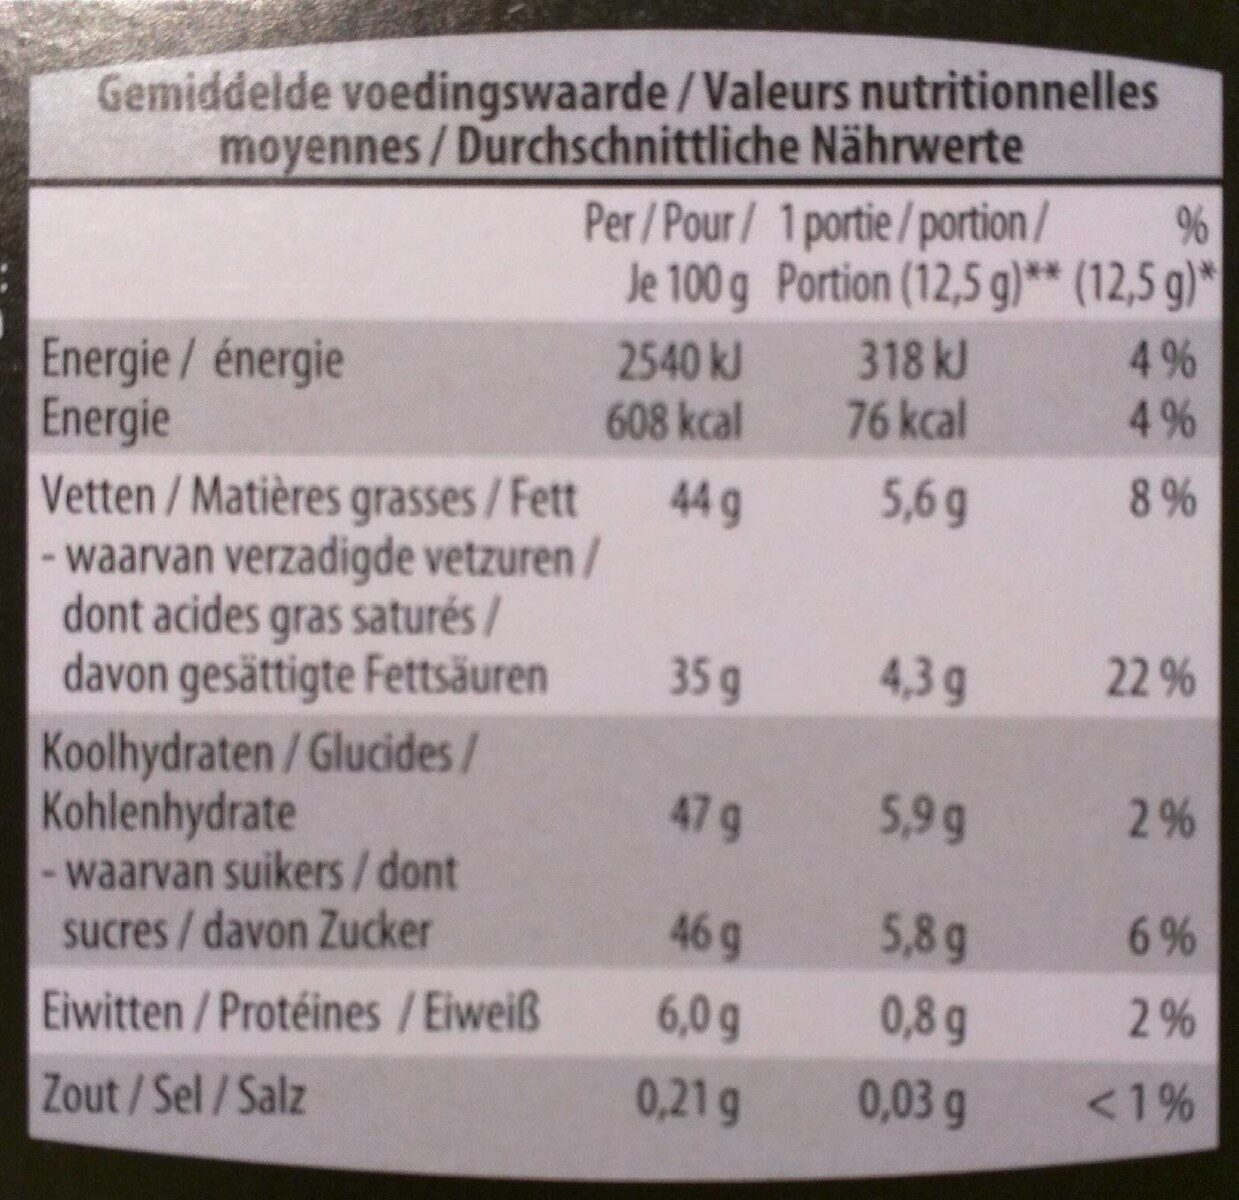 Truffles (Truffes au chocolat) - Nutrition facts